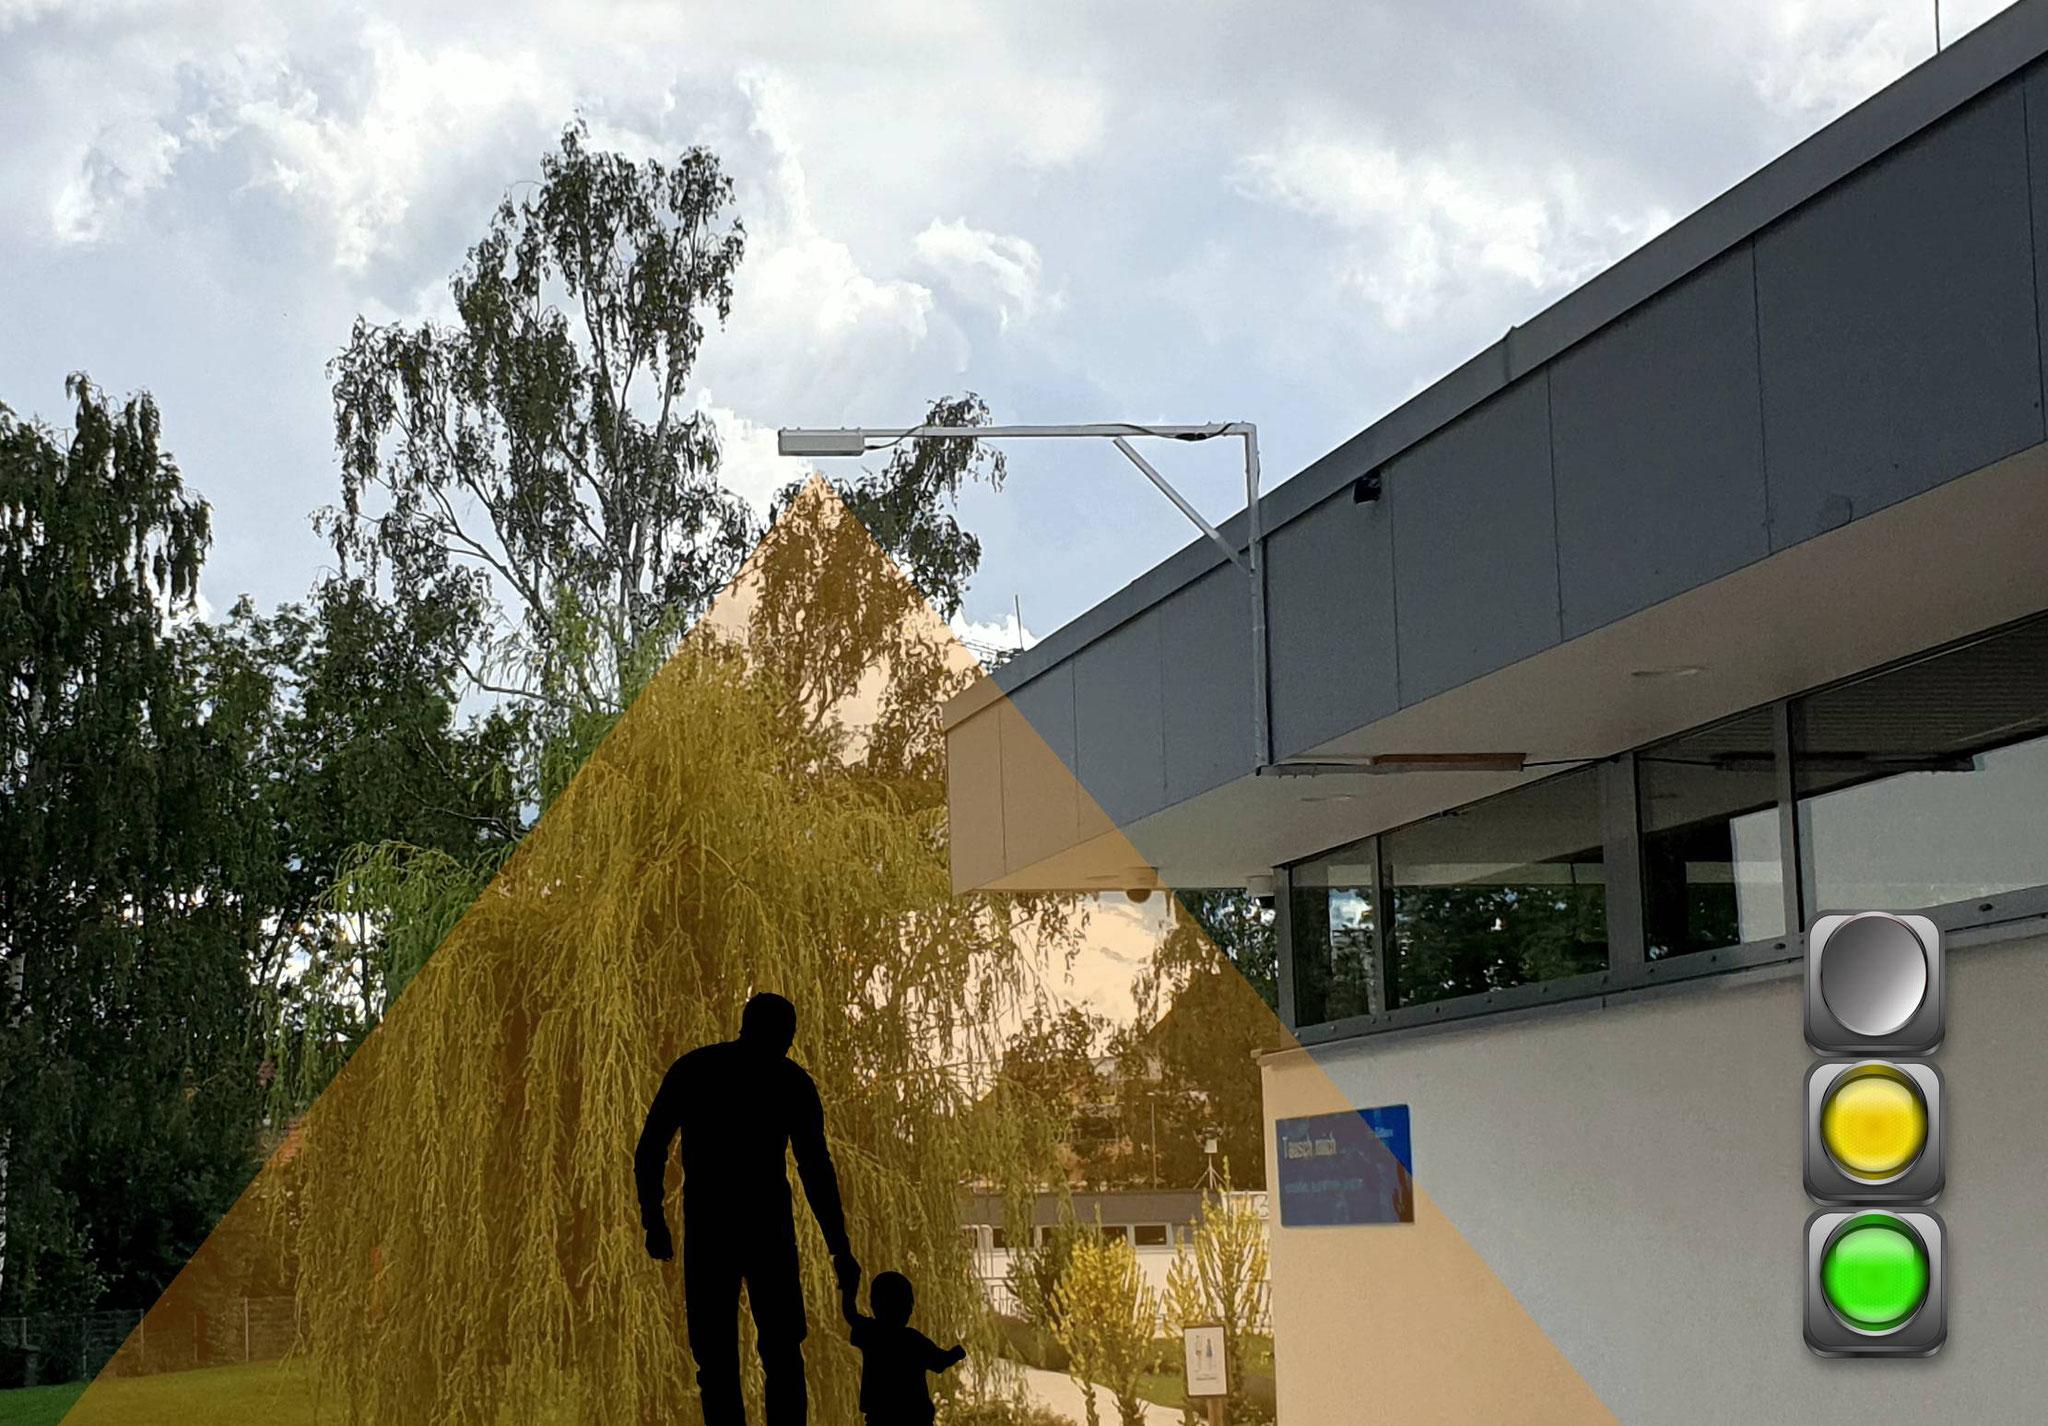 Kunde: Stadt Langenau - Personenzählung Freibad (Stereoskophische Kamerasensoren & Webservices)